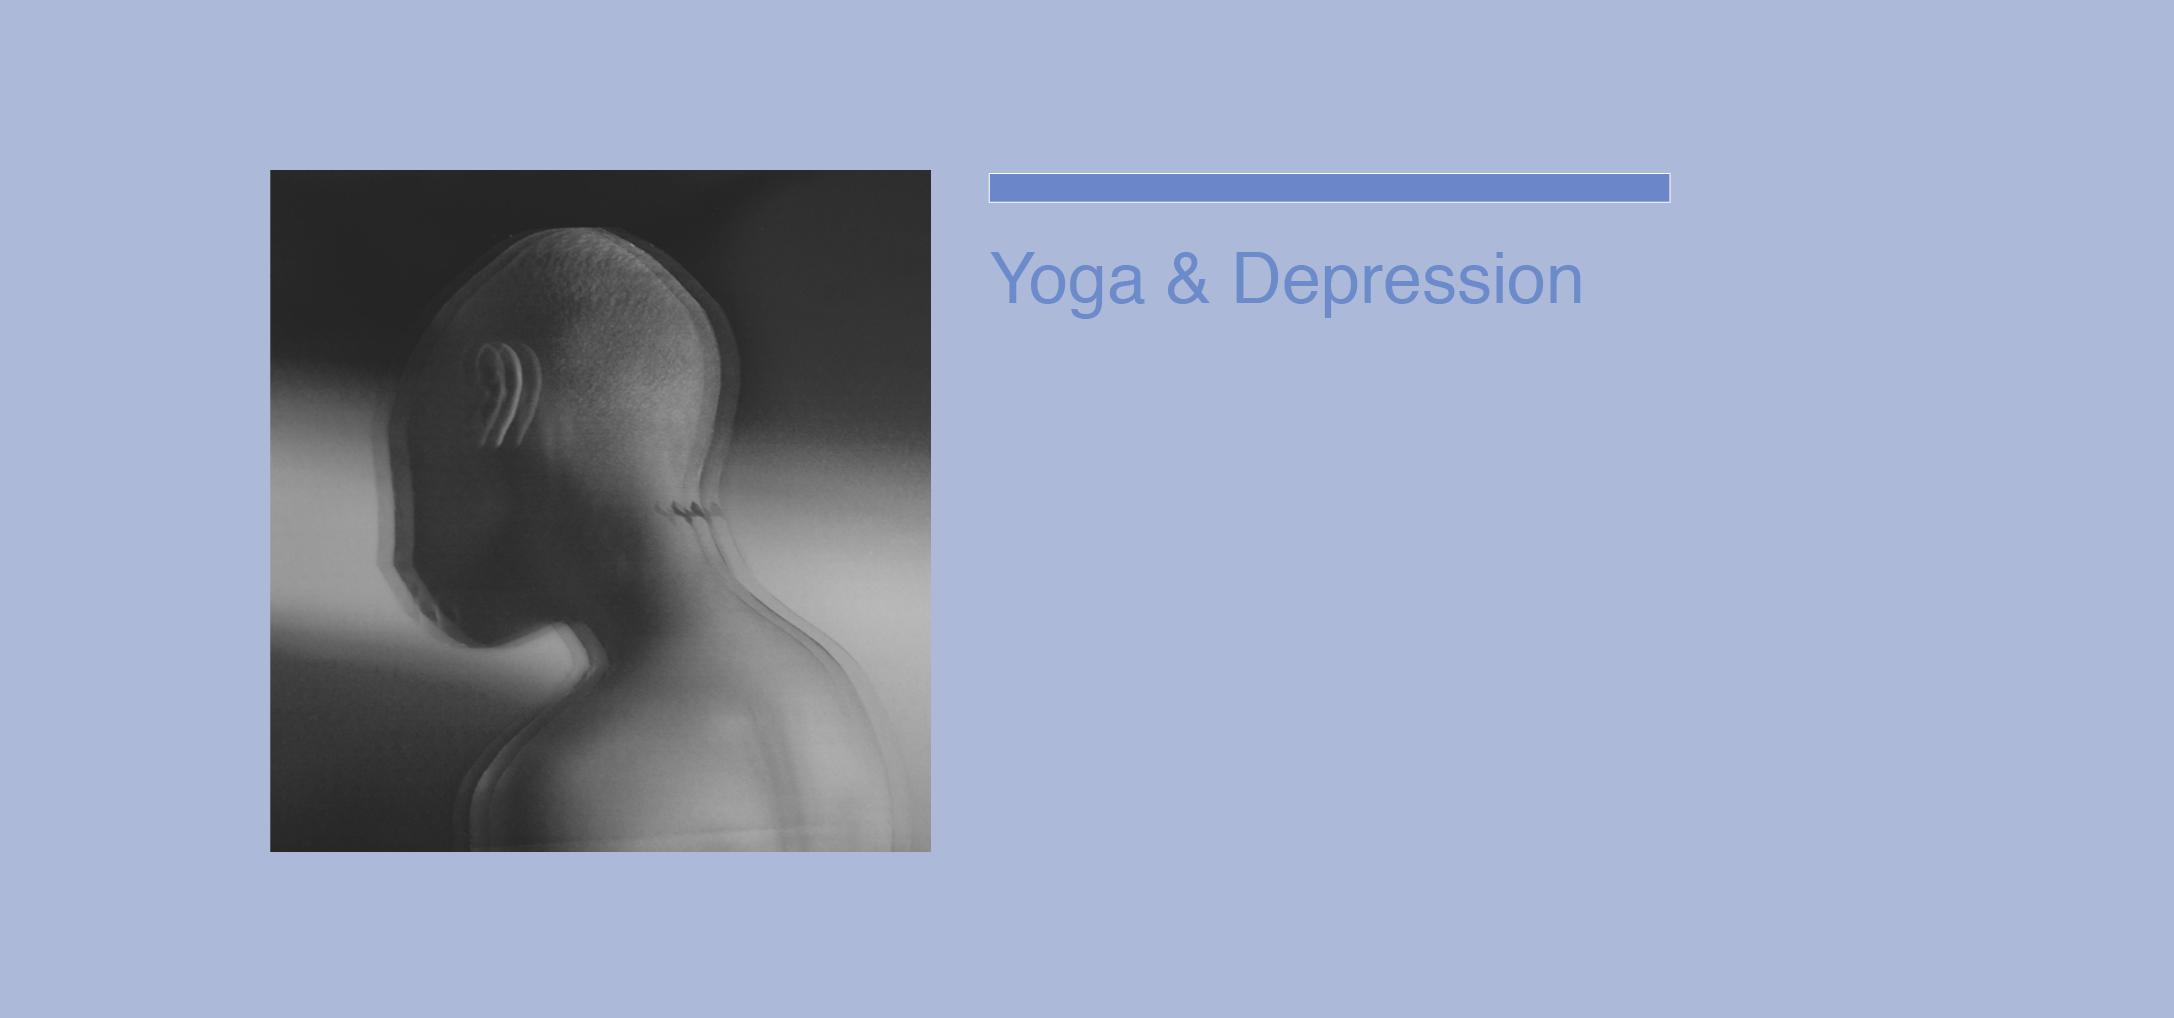 Hilft Yoga bei Depression?